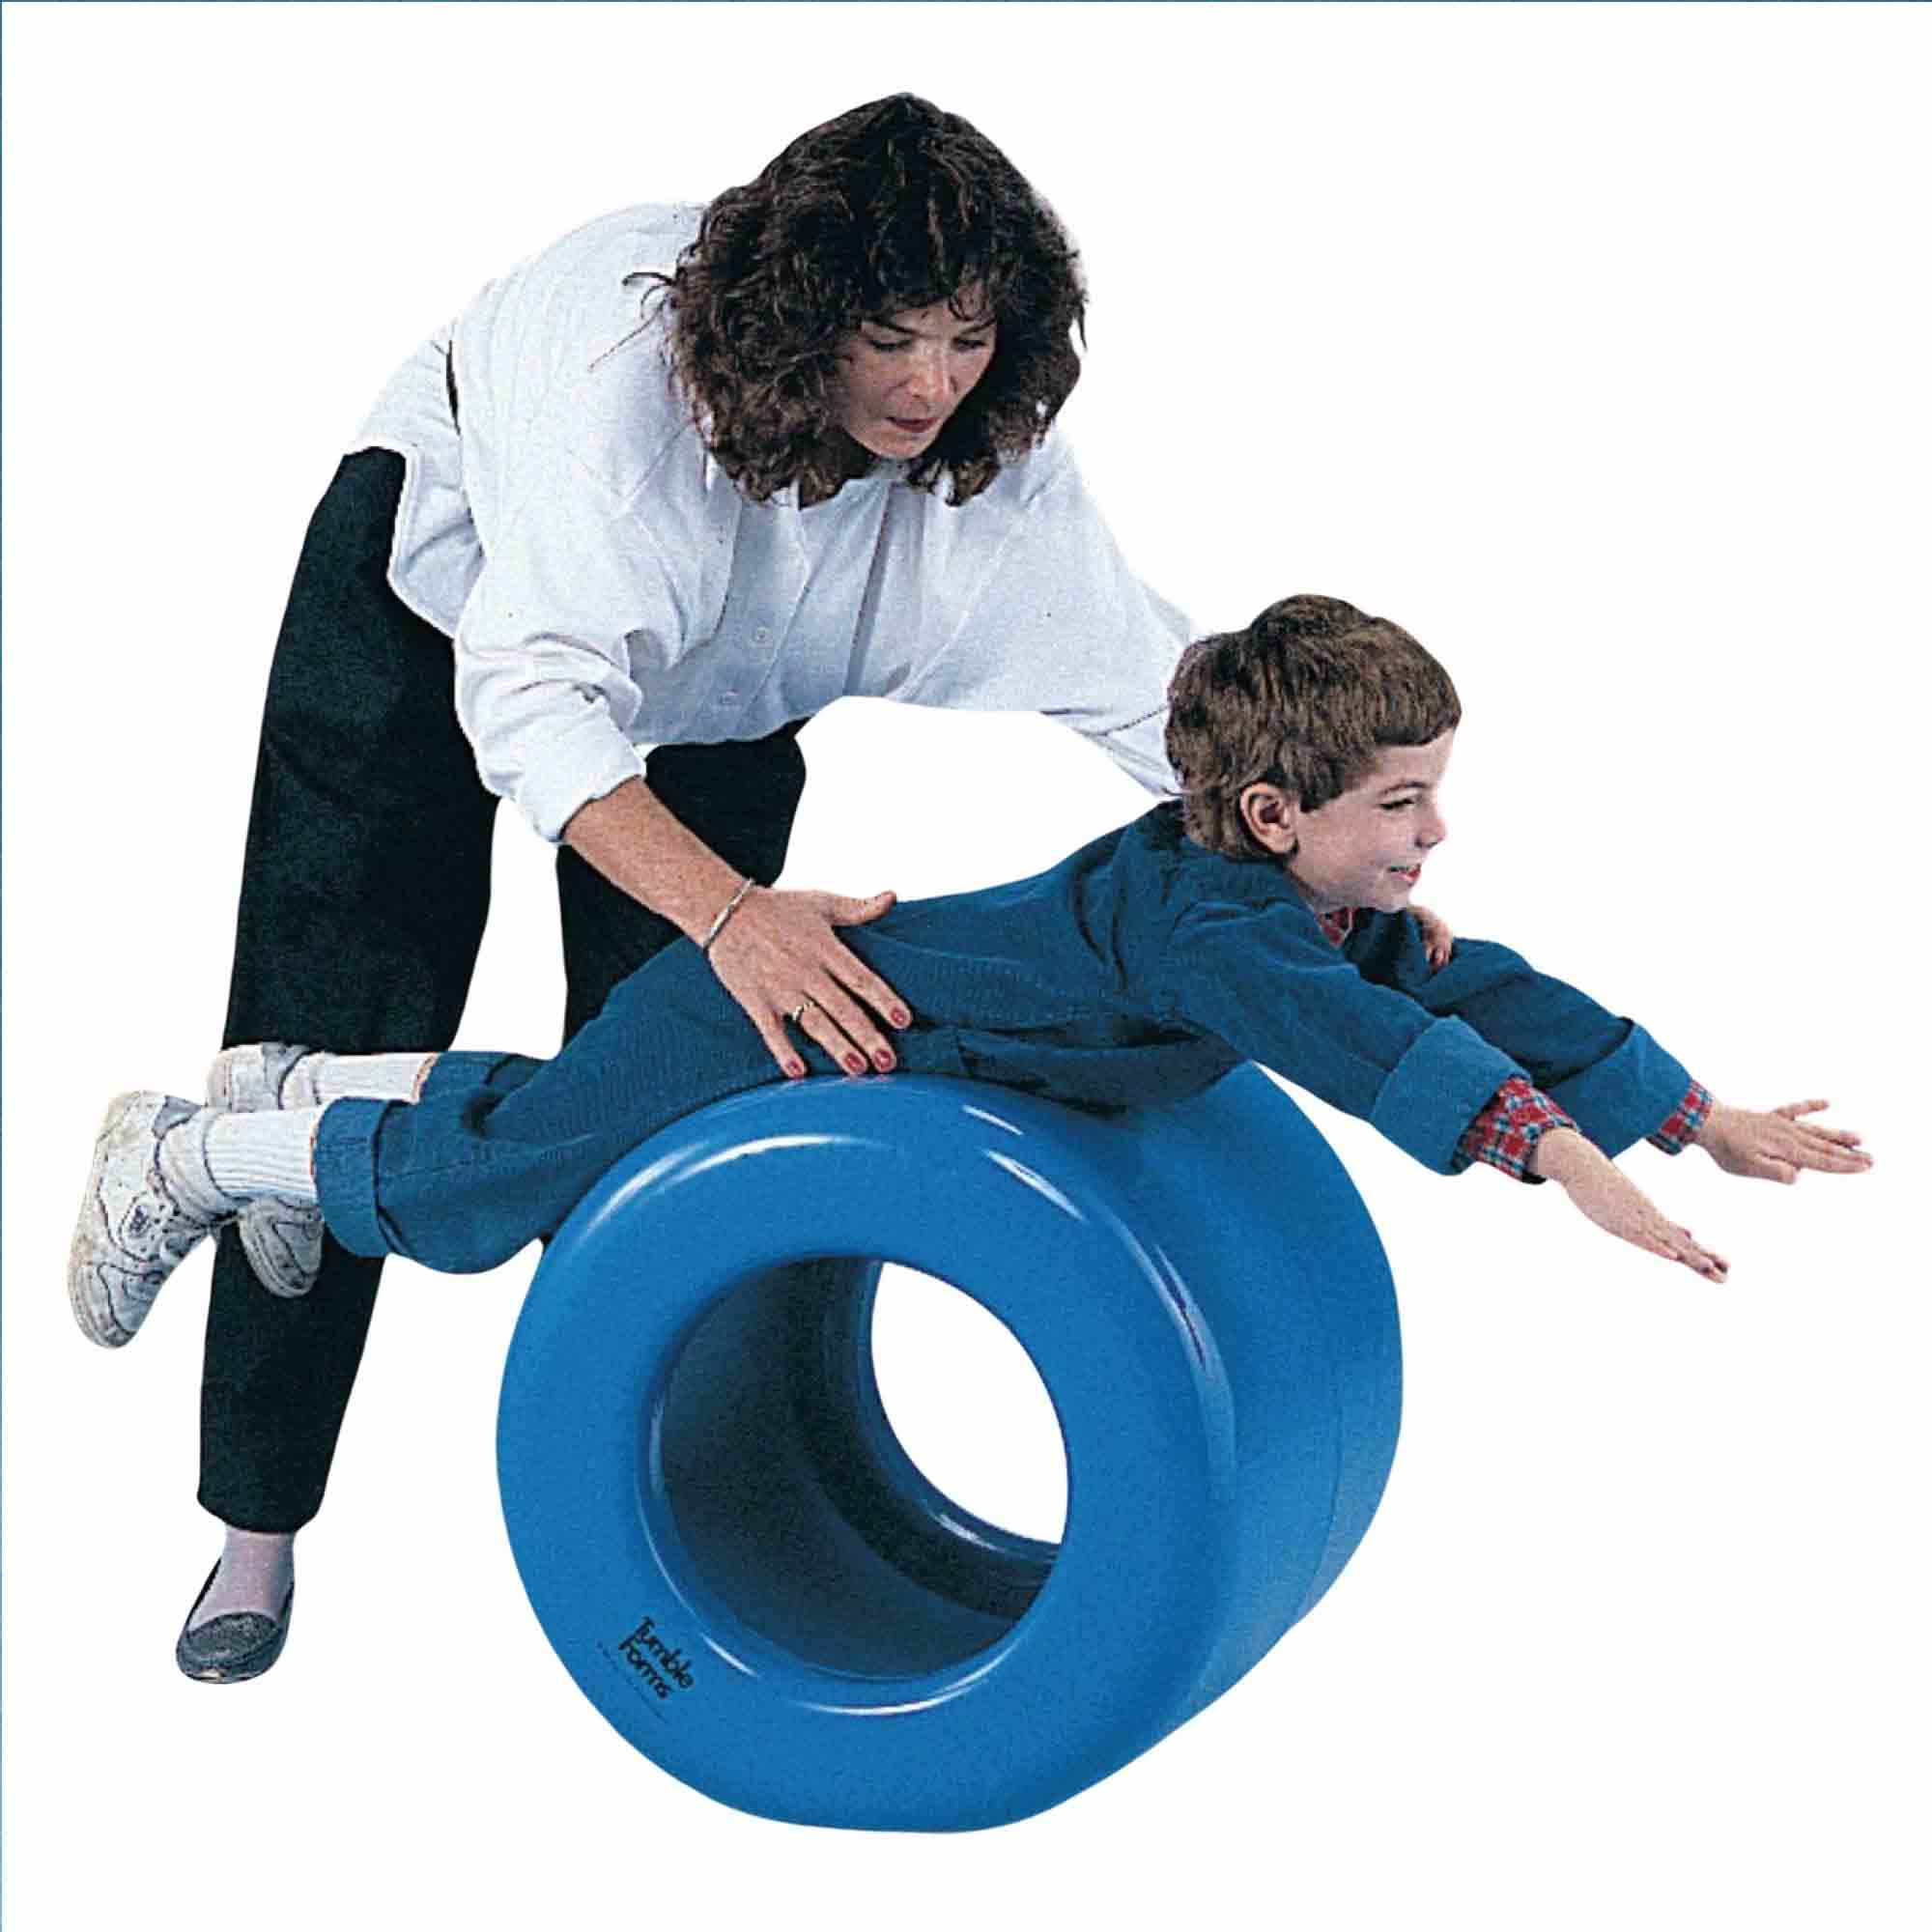 Tumble Forms barrel crawl/roll